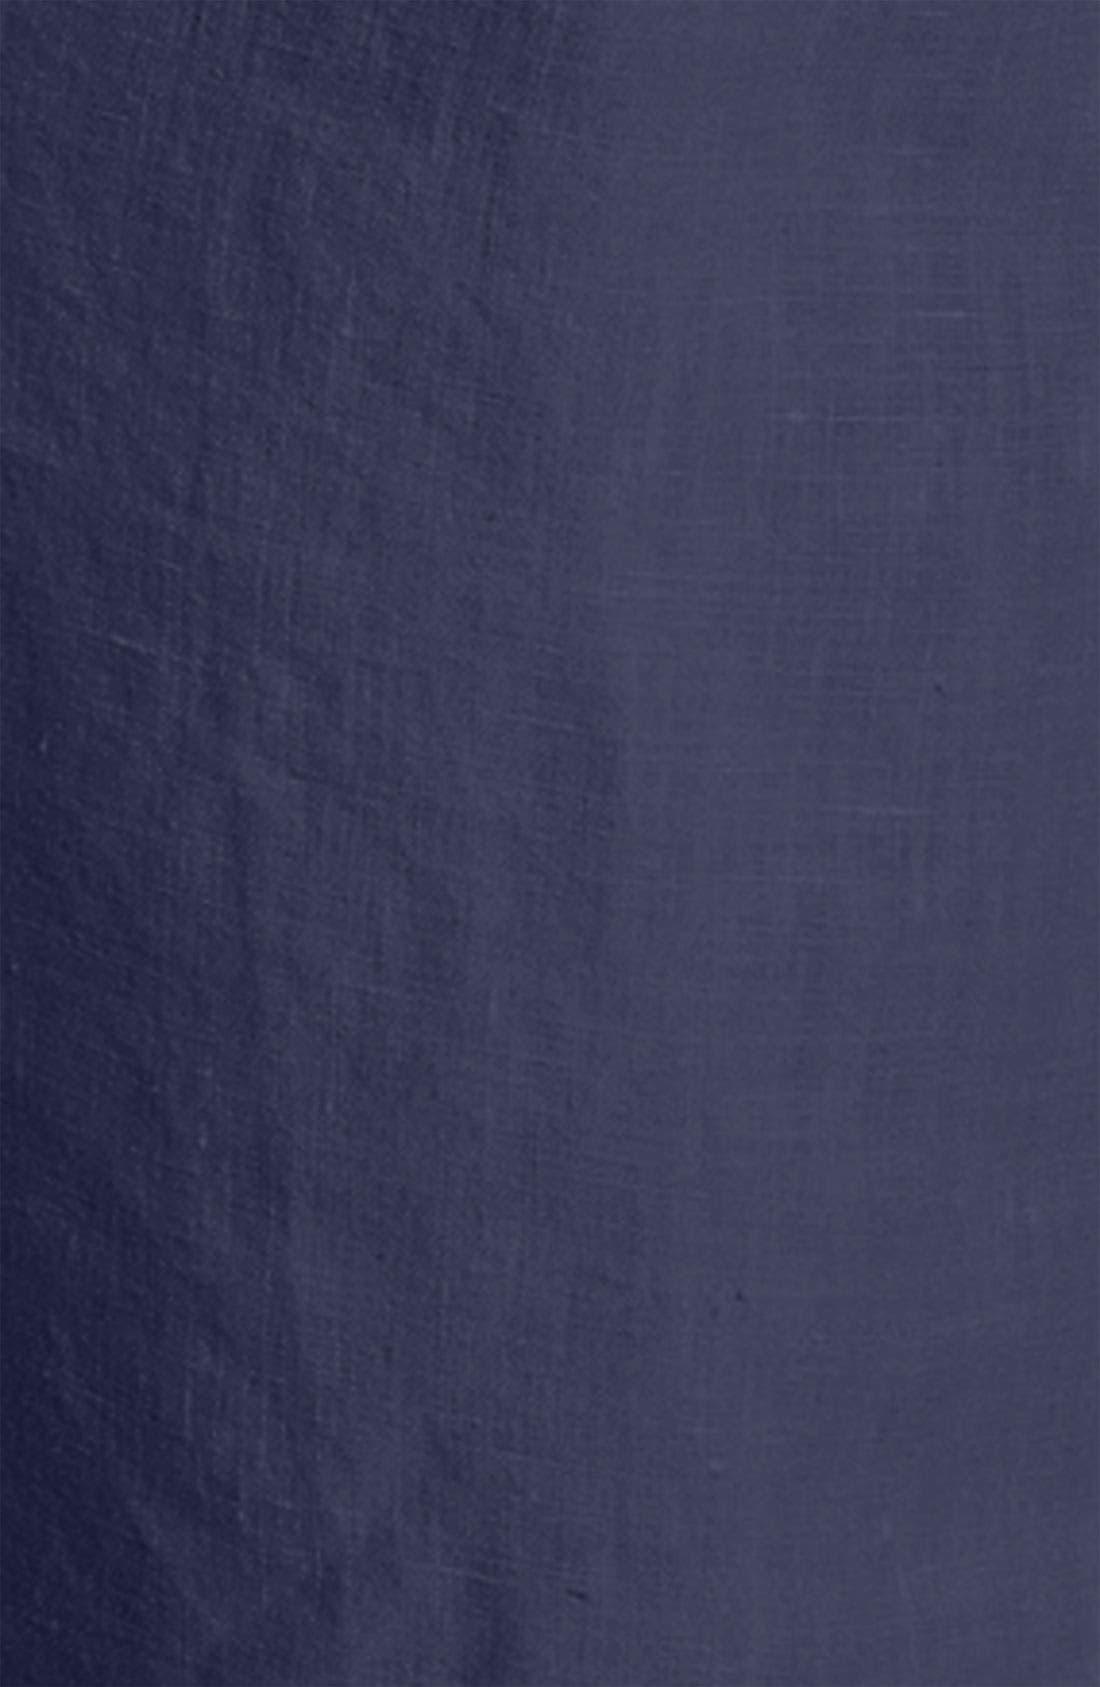 Alternate Image 3  - Vilebrequin 'Baie' Linen Shorts